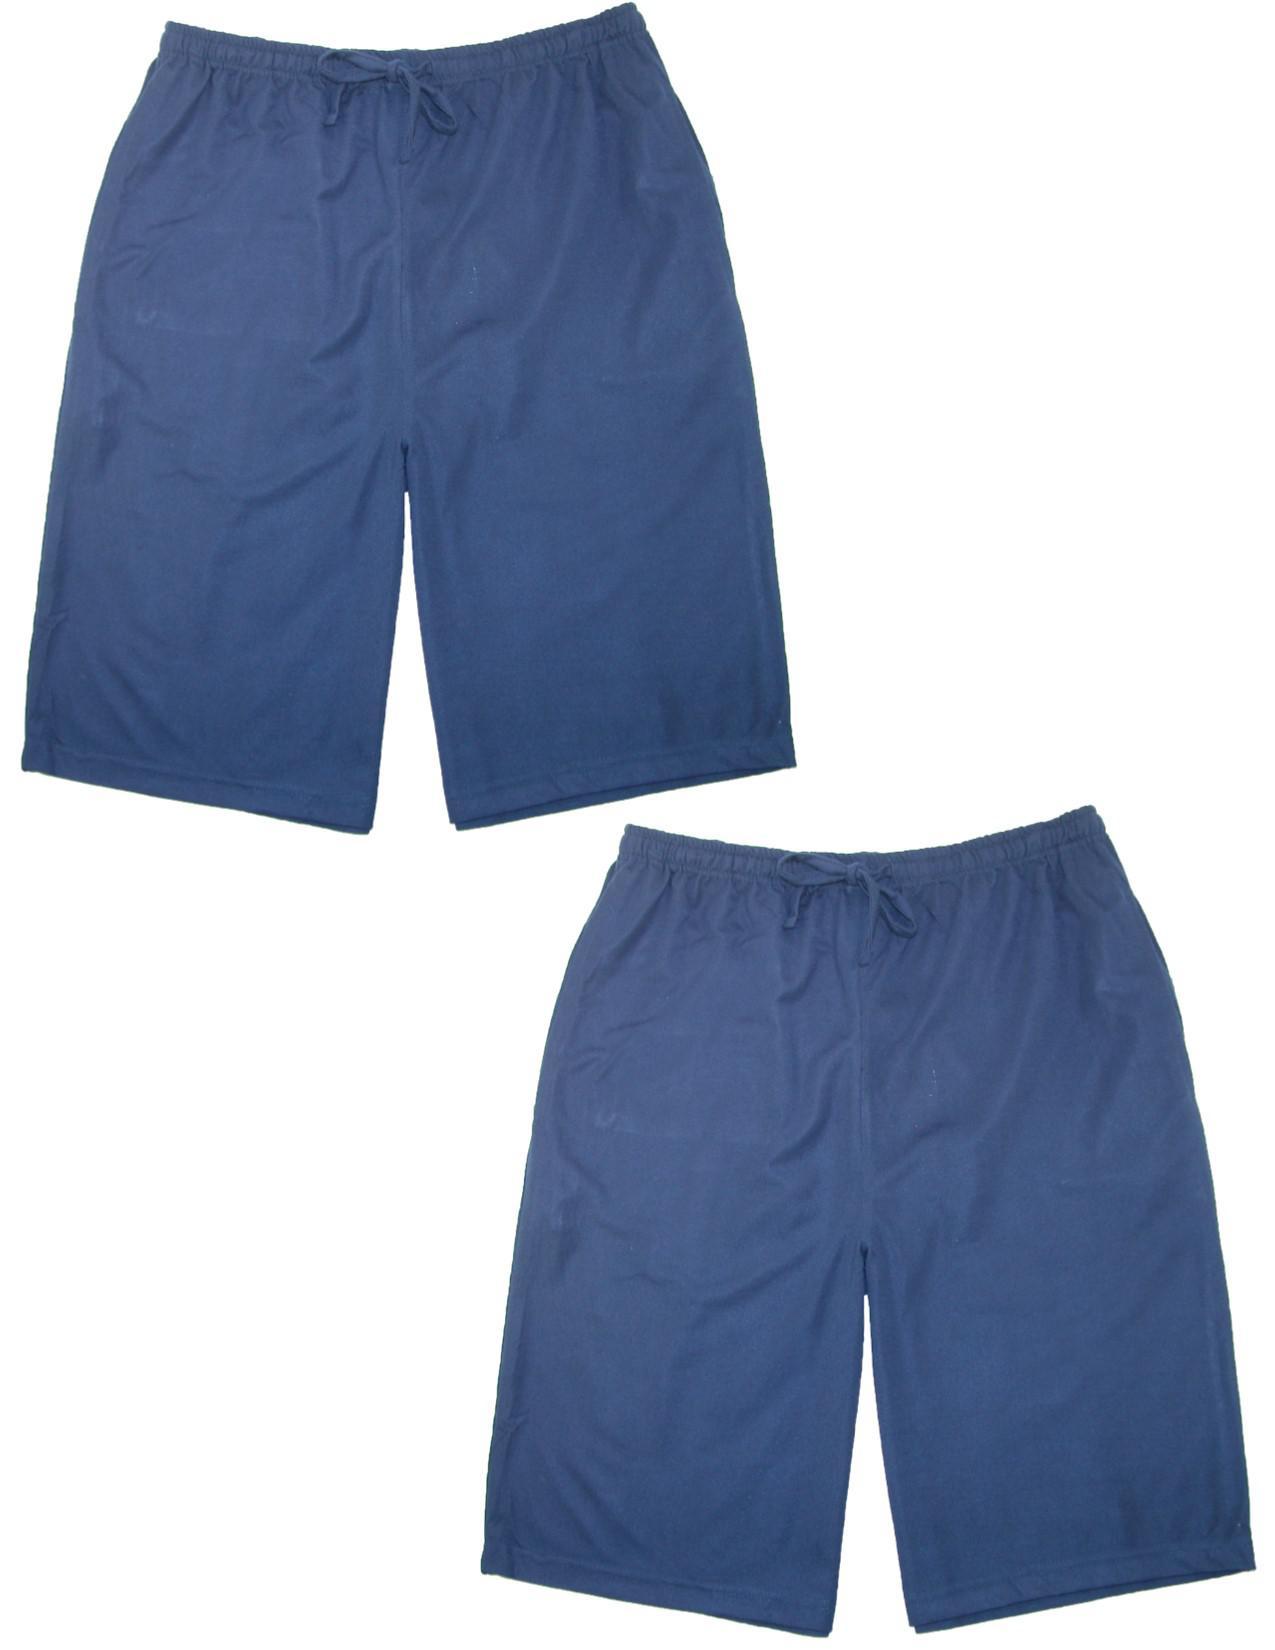 770d92a98 Ten West Apparel Pants